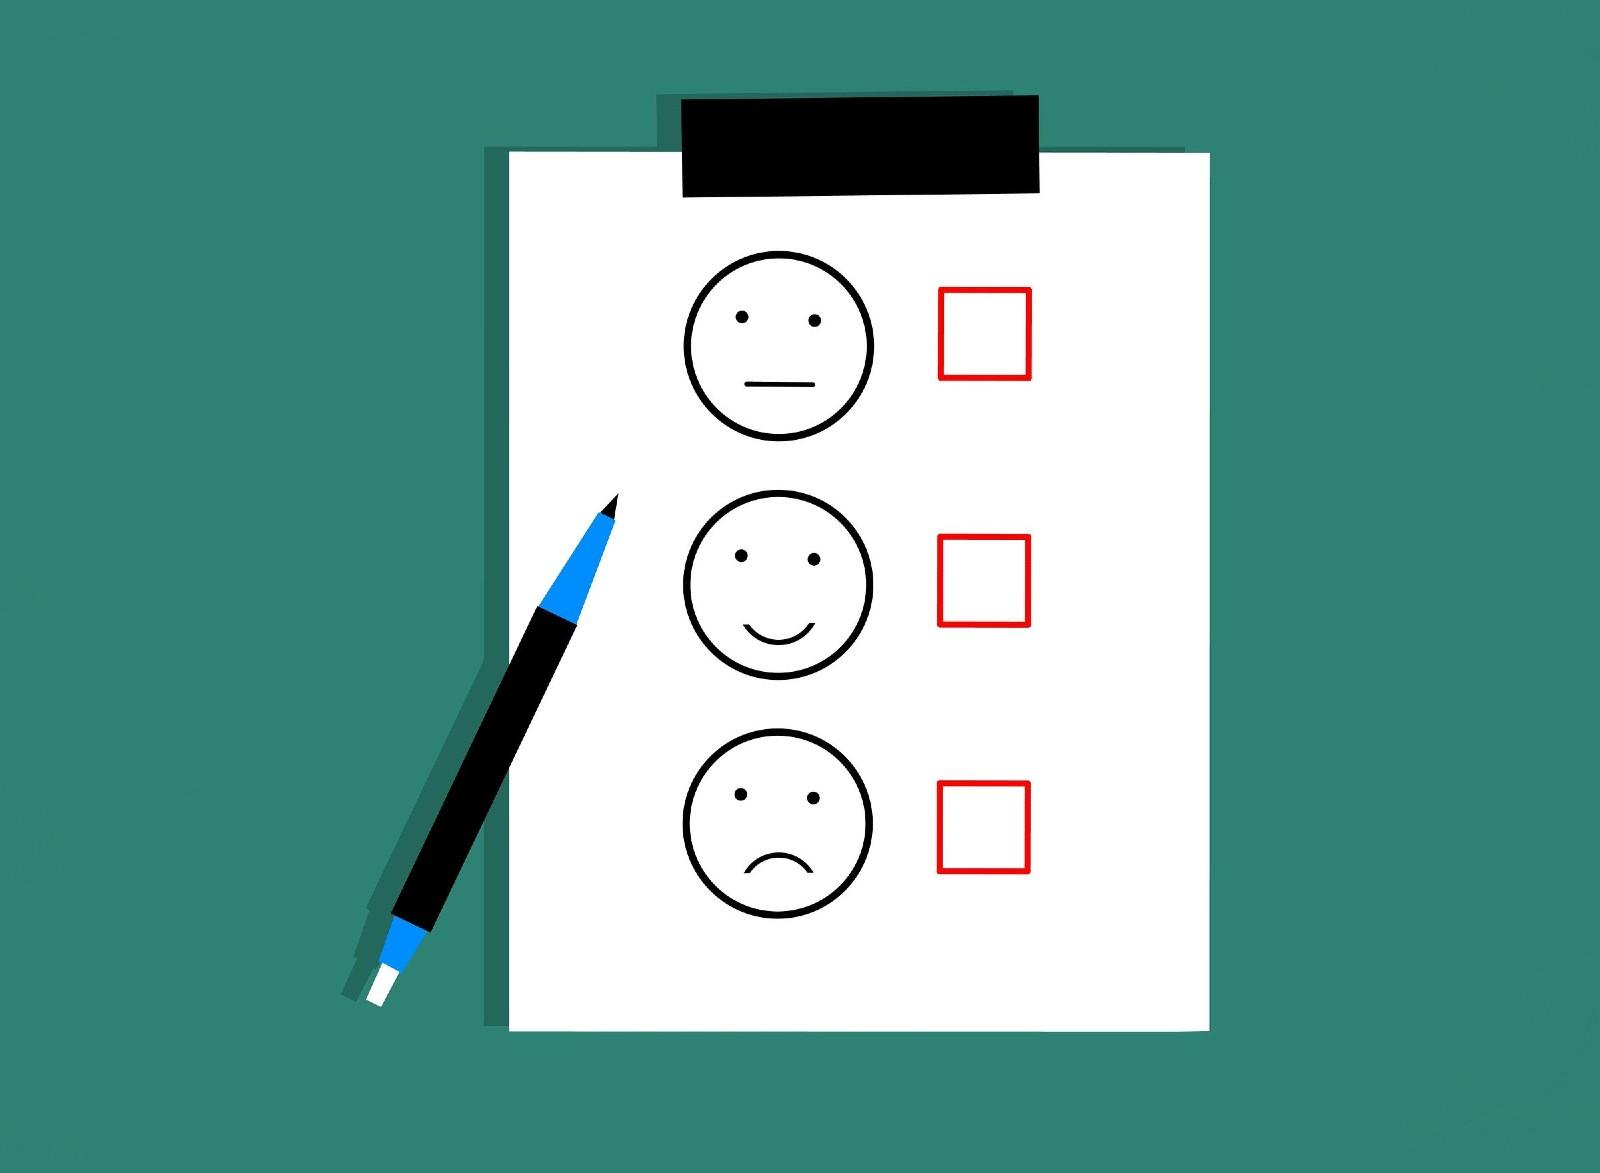 an illustration of a feedback form